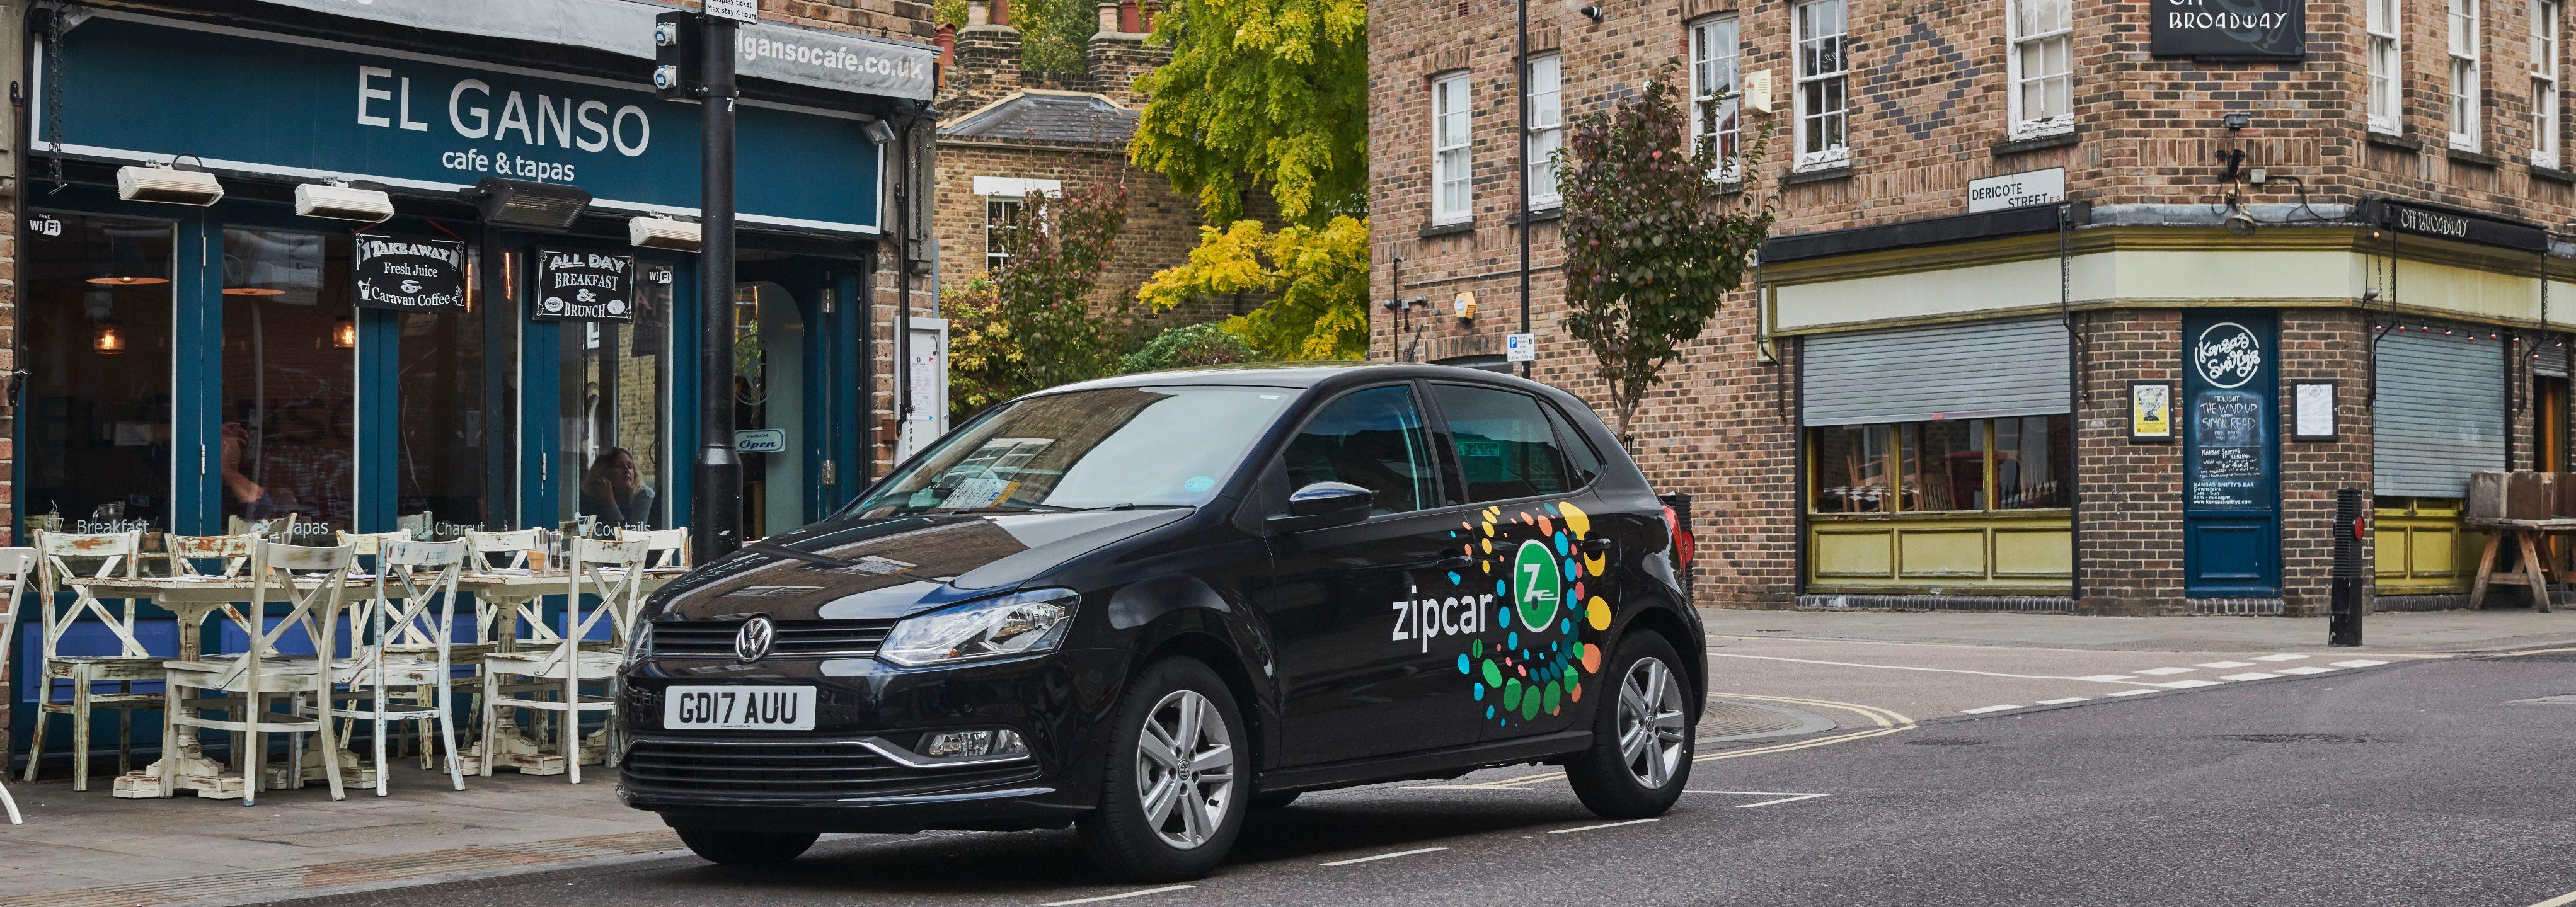 Zipcar flex